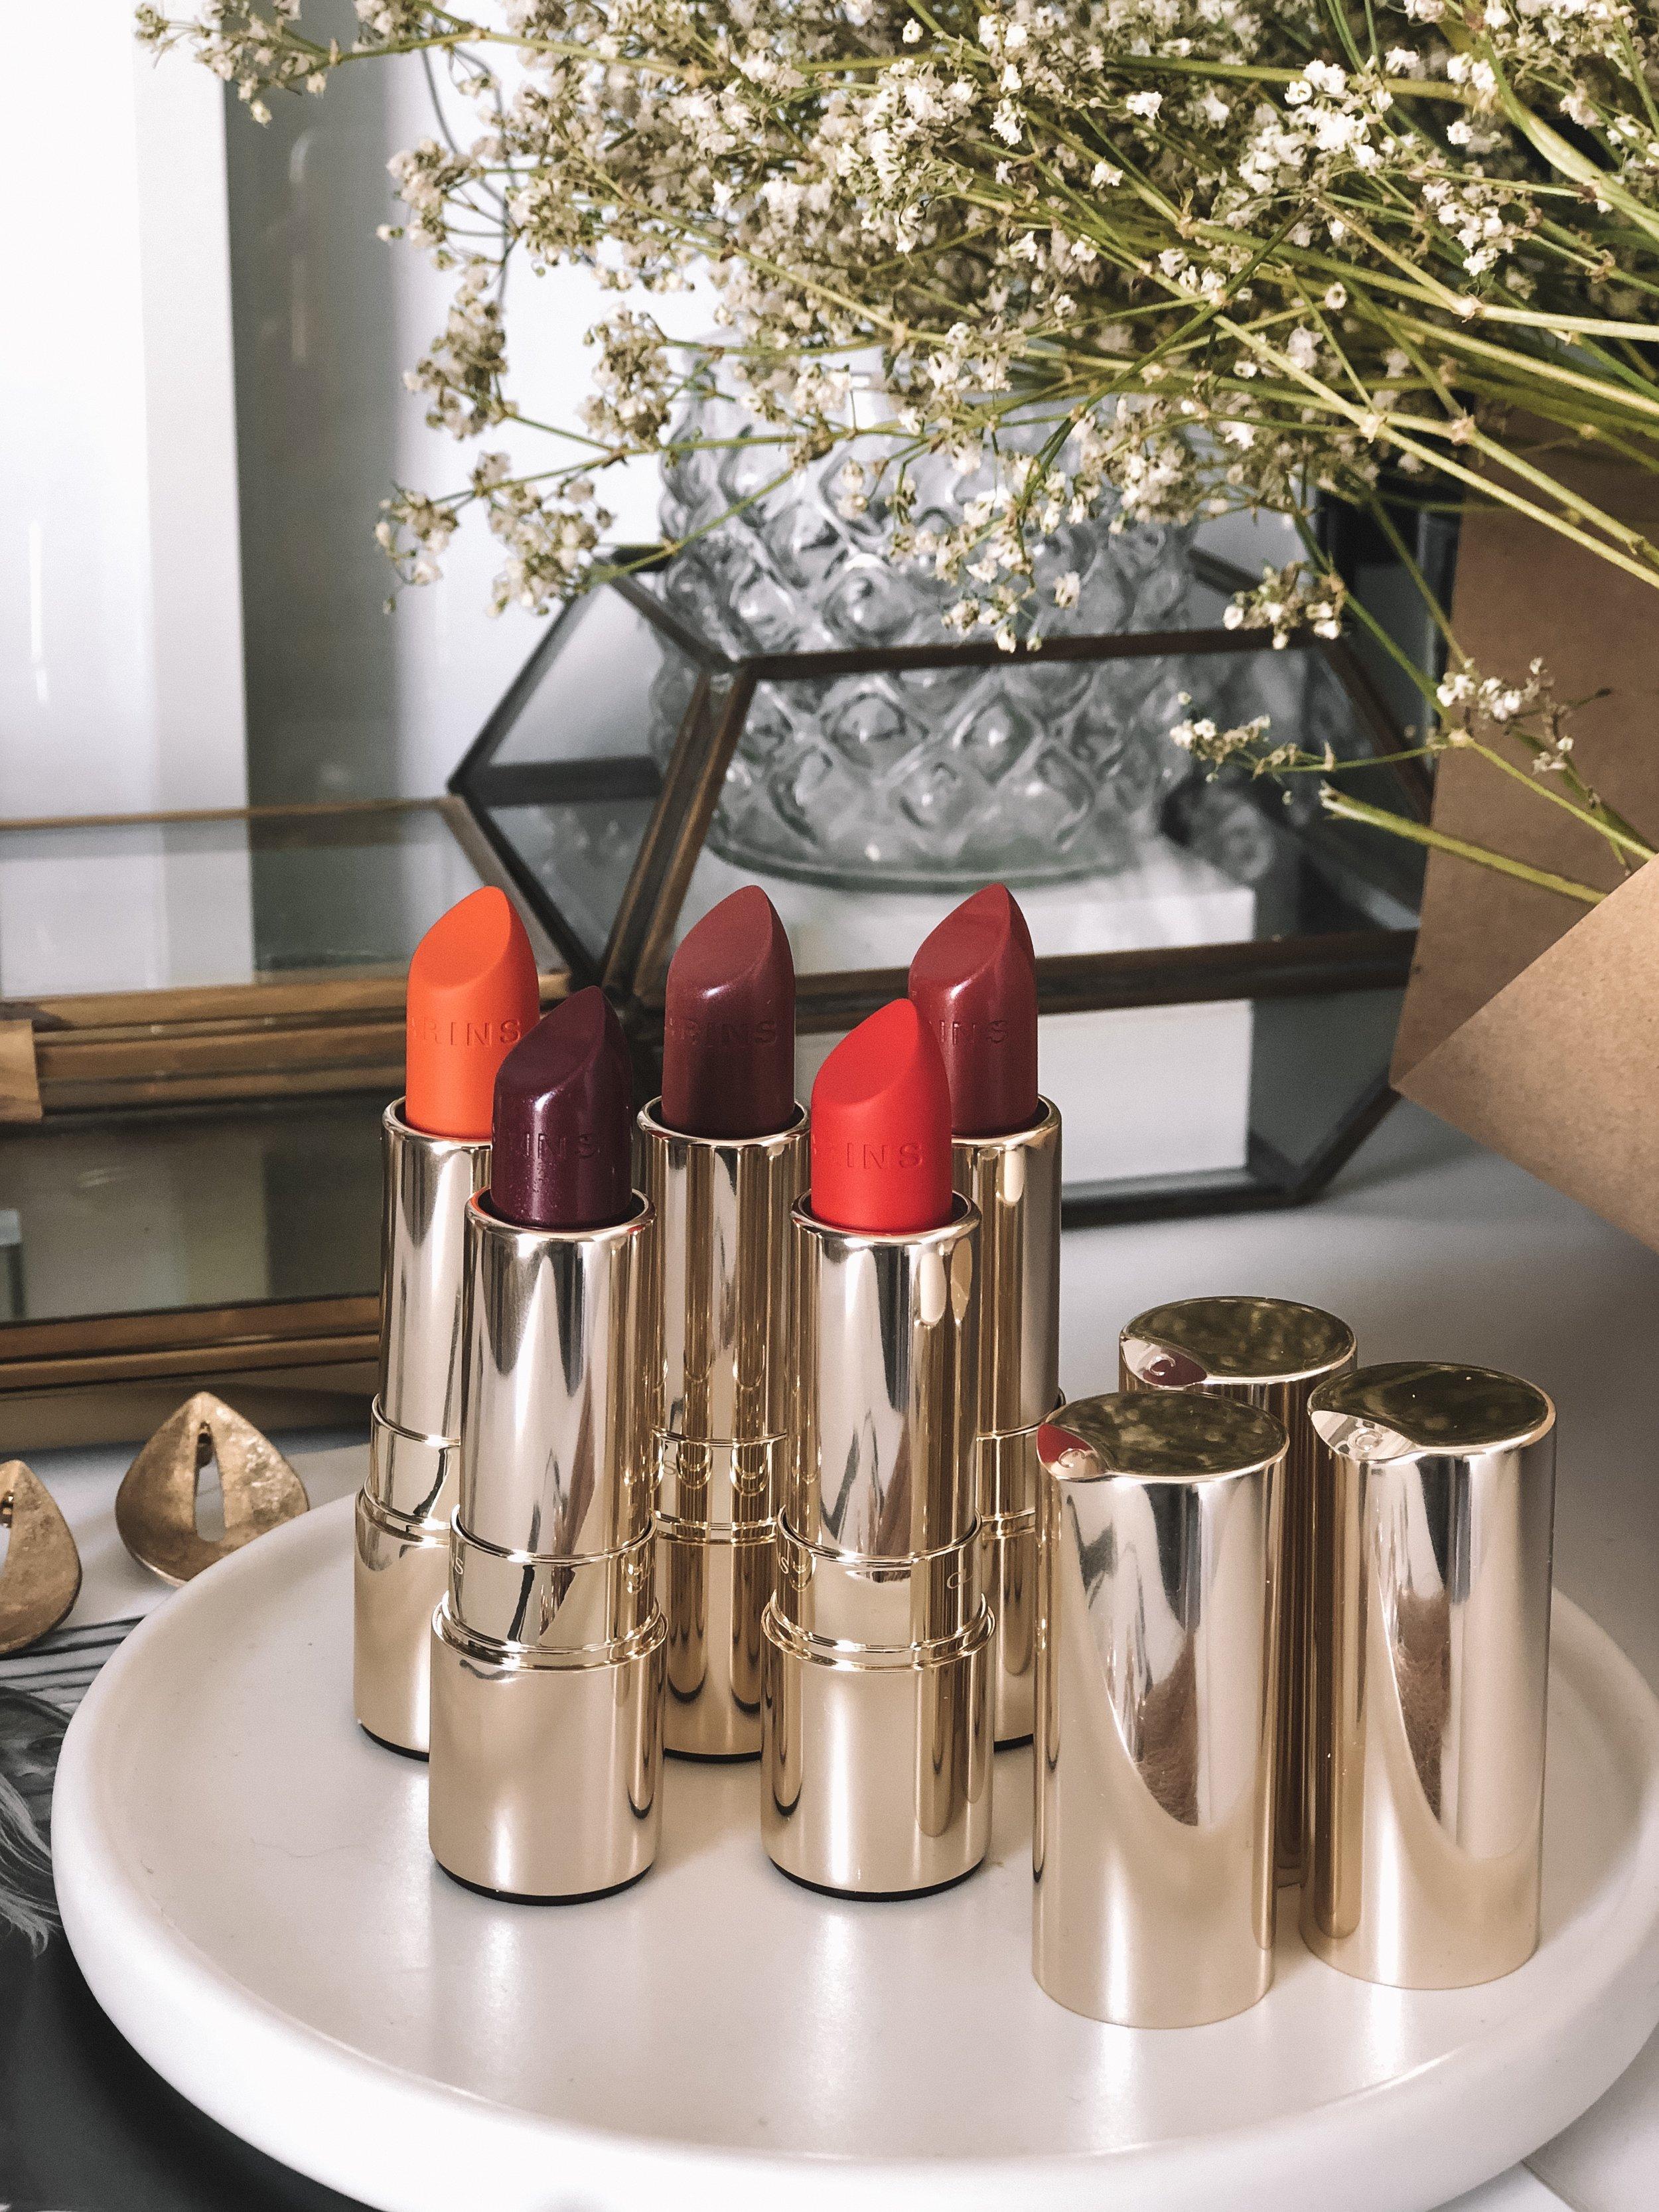 Clarins Joli Rouge Lipstick Colours